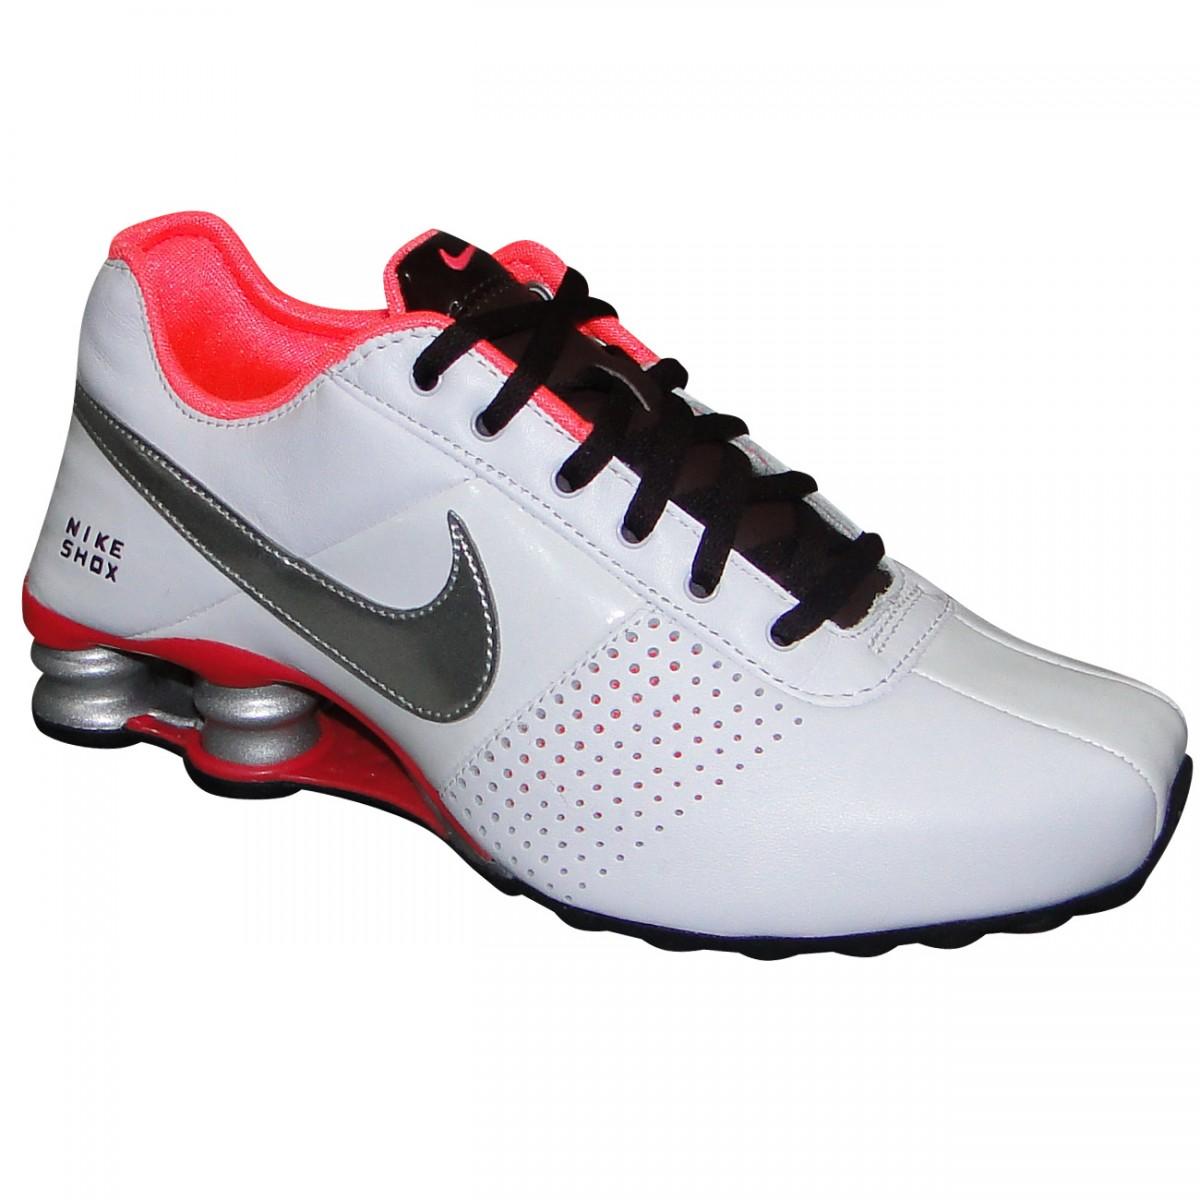 7d423b904df Tenis Nike Shox Deliver 317549 113 - Branco Prata Pink - Chuteira ...